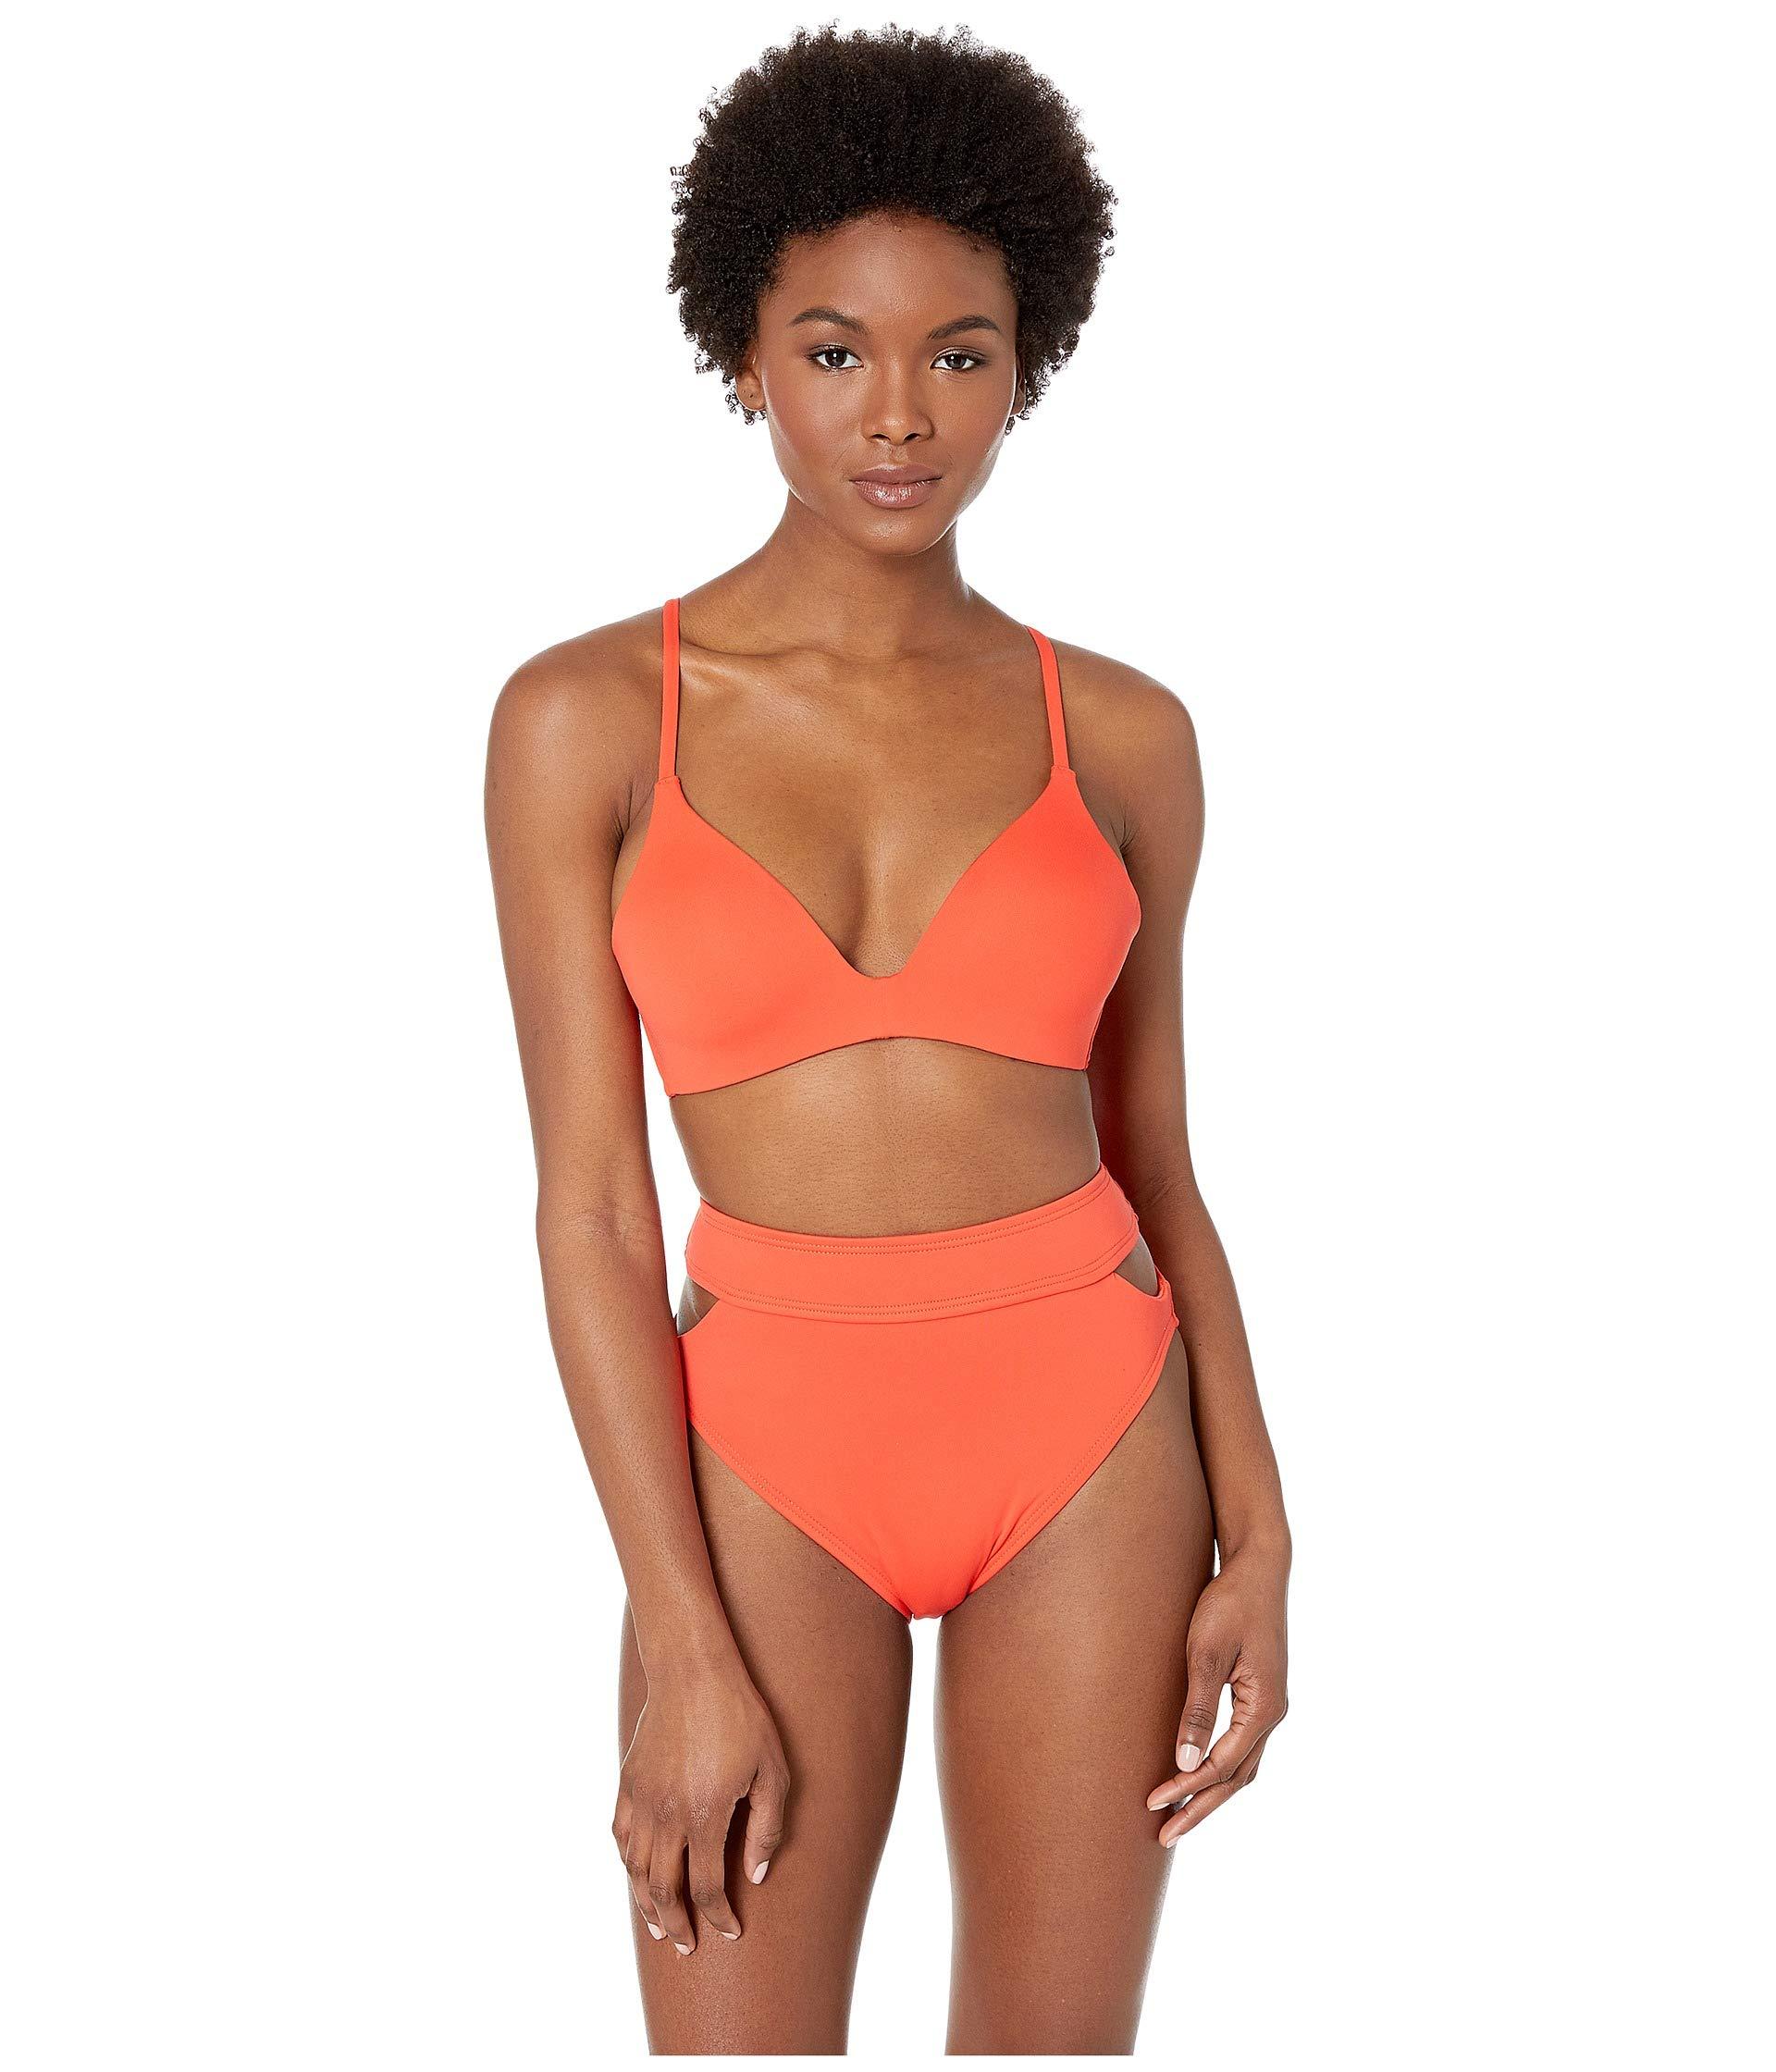 Vince Camuto Shades Top Surf Molded Koi Bikini qA1xqSPrw